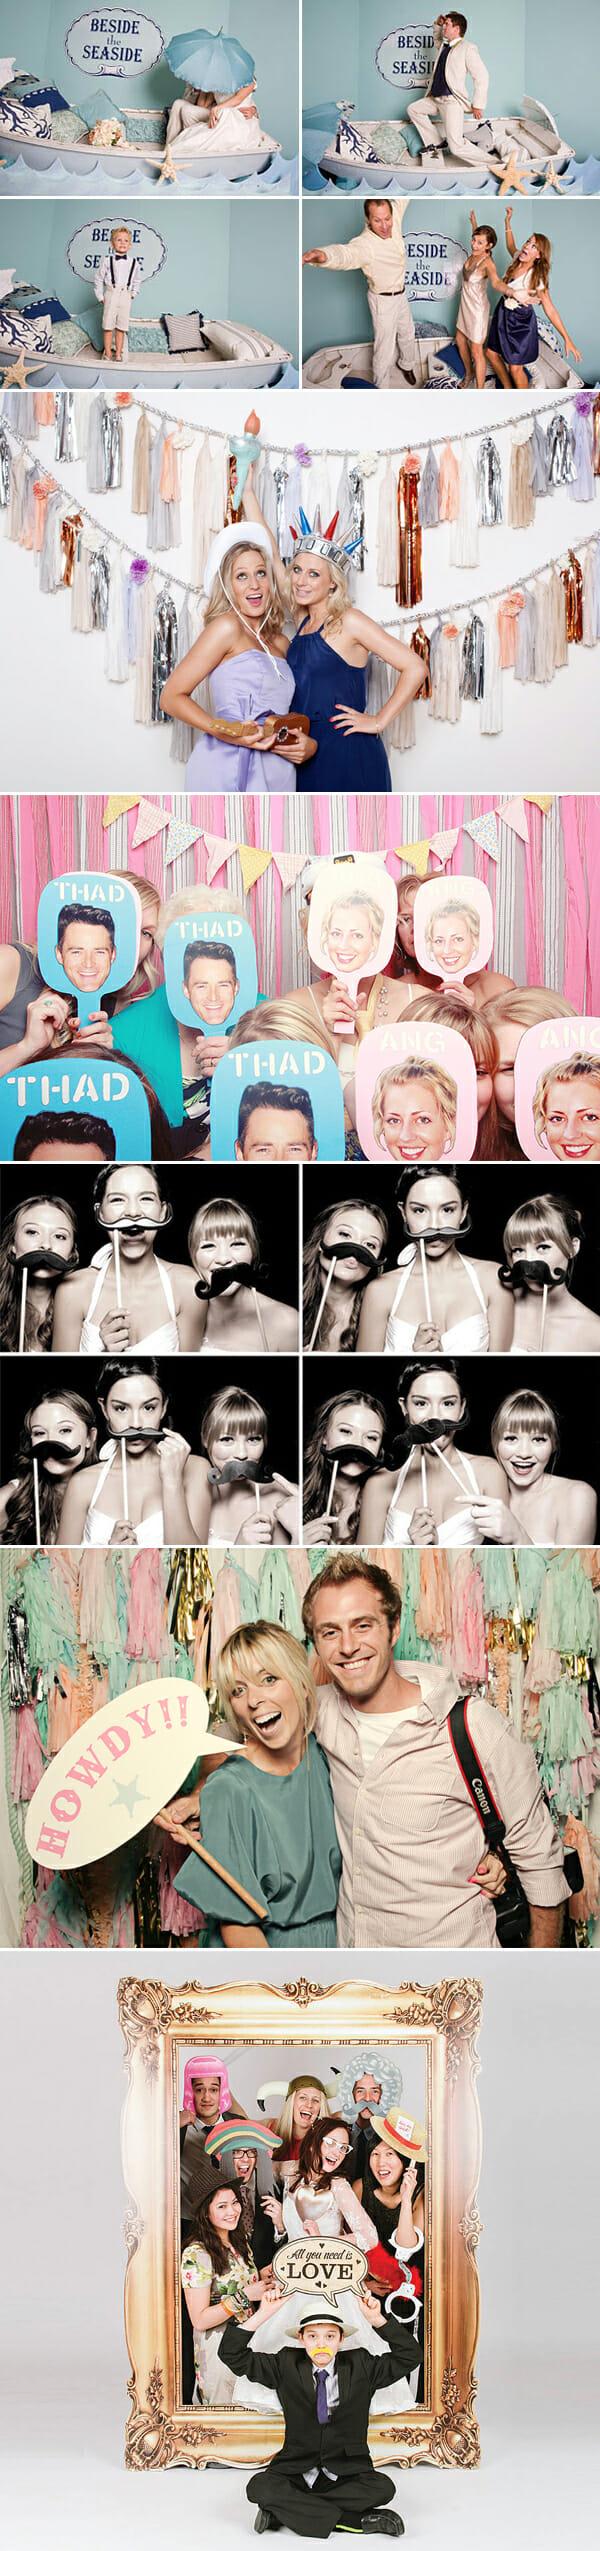 photobooth04-friends